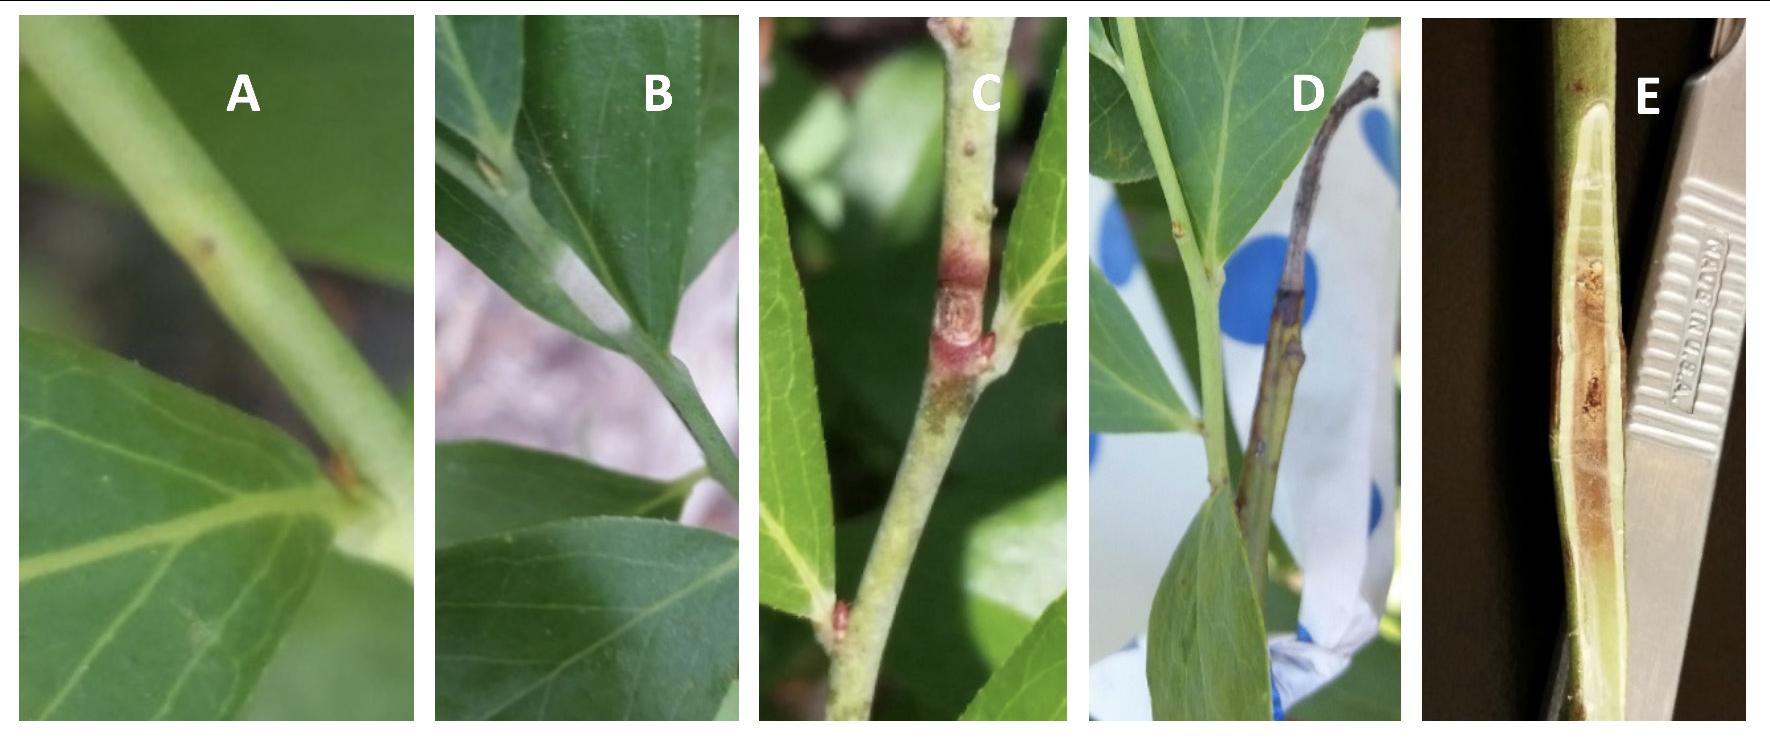 Progression of exobasidium shoot spots